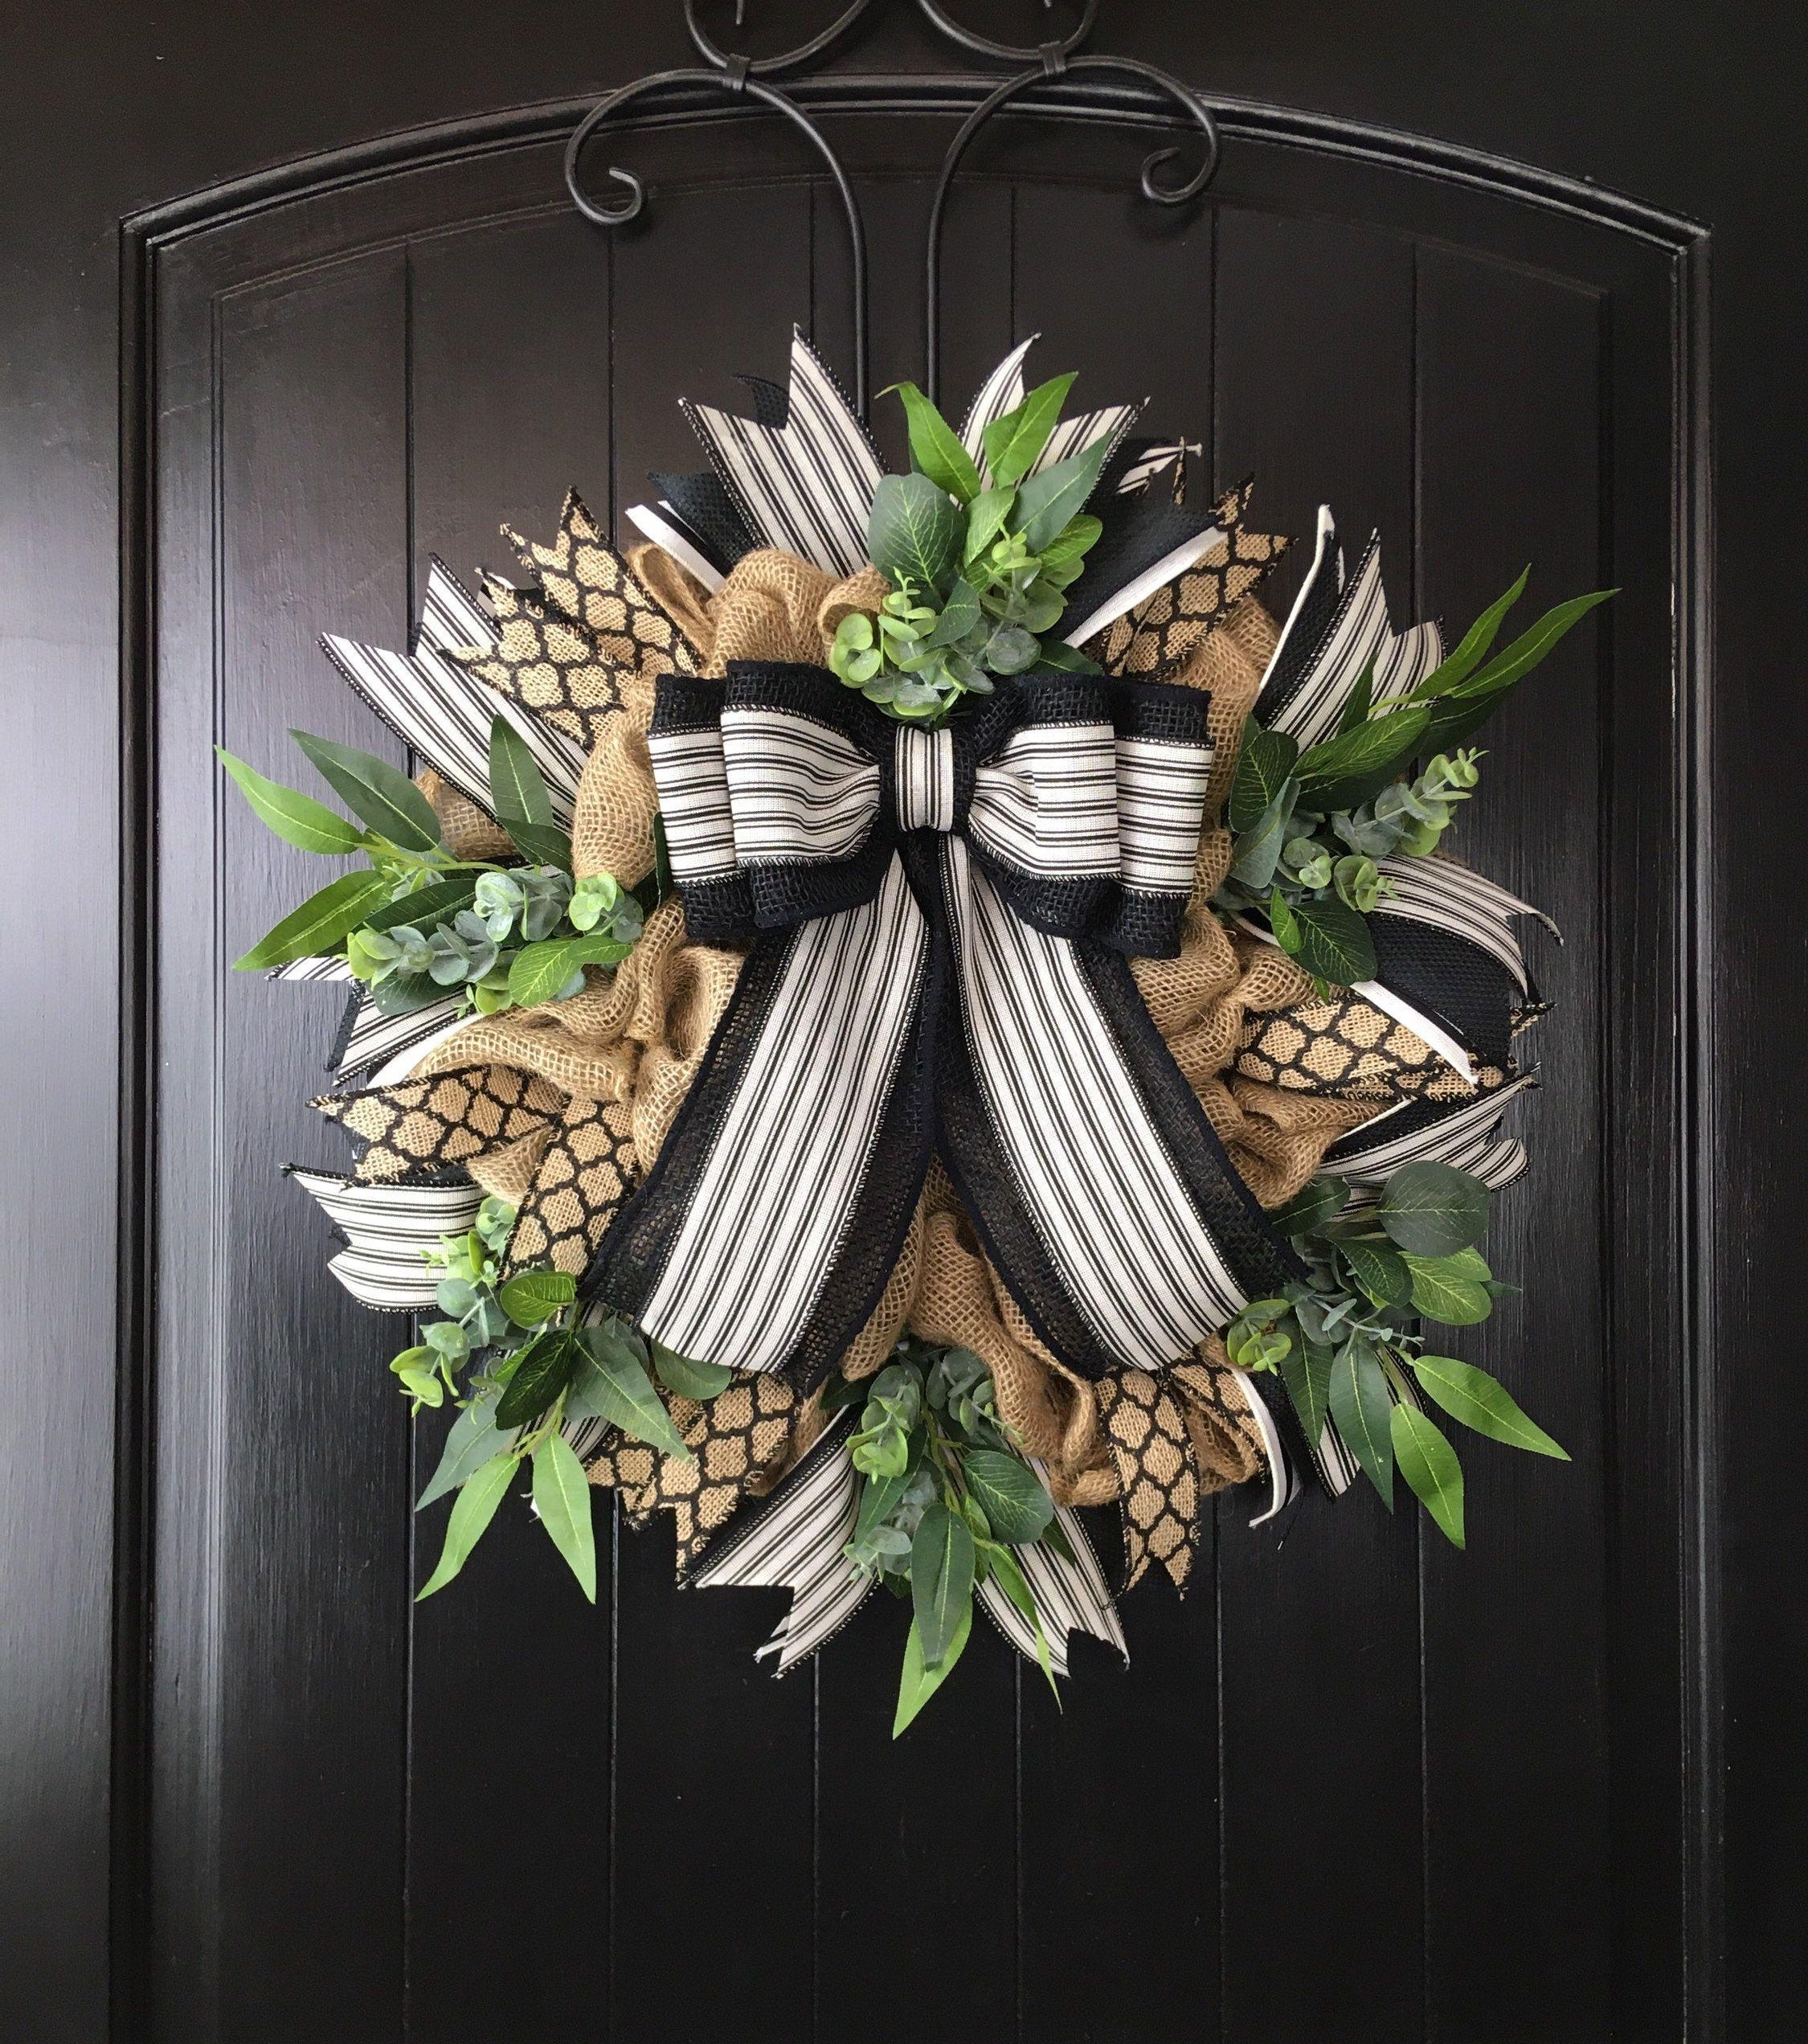 Photo of Peasant wreath, year-round wreath, rustic decor, black stripe, burlap wreaths, primitive wreaths, farmhouse decor, rustic farmhouse decor